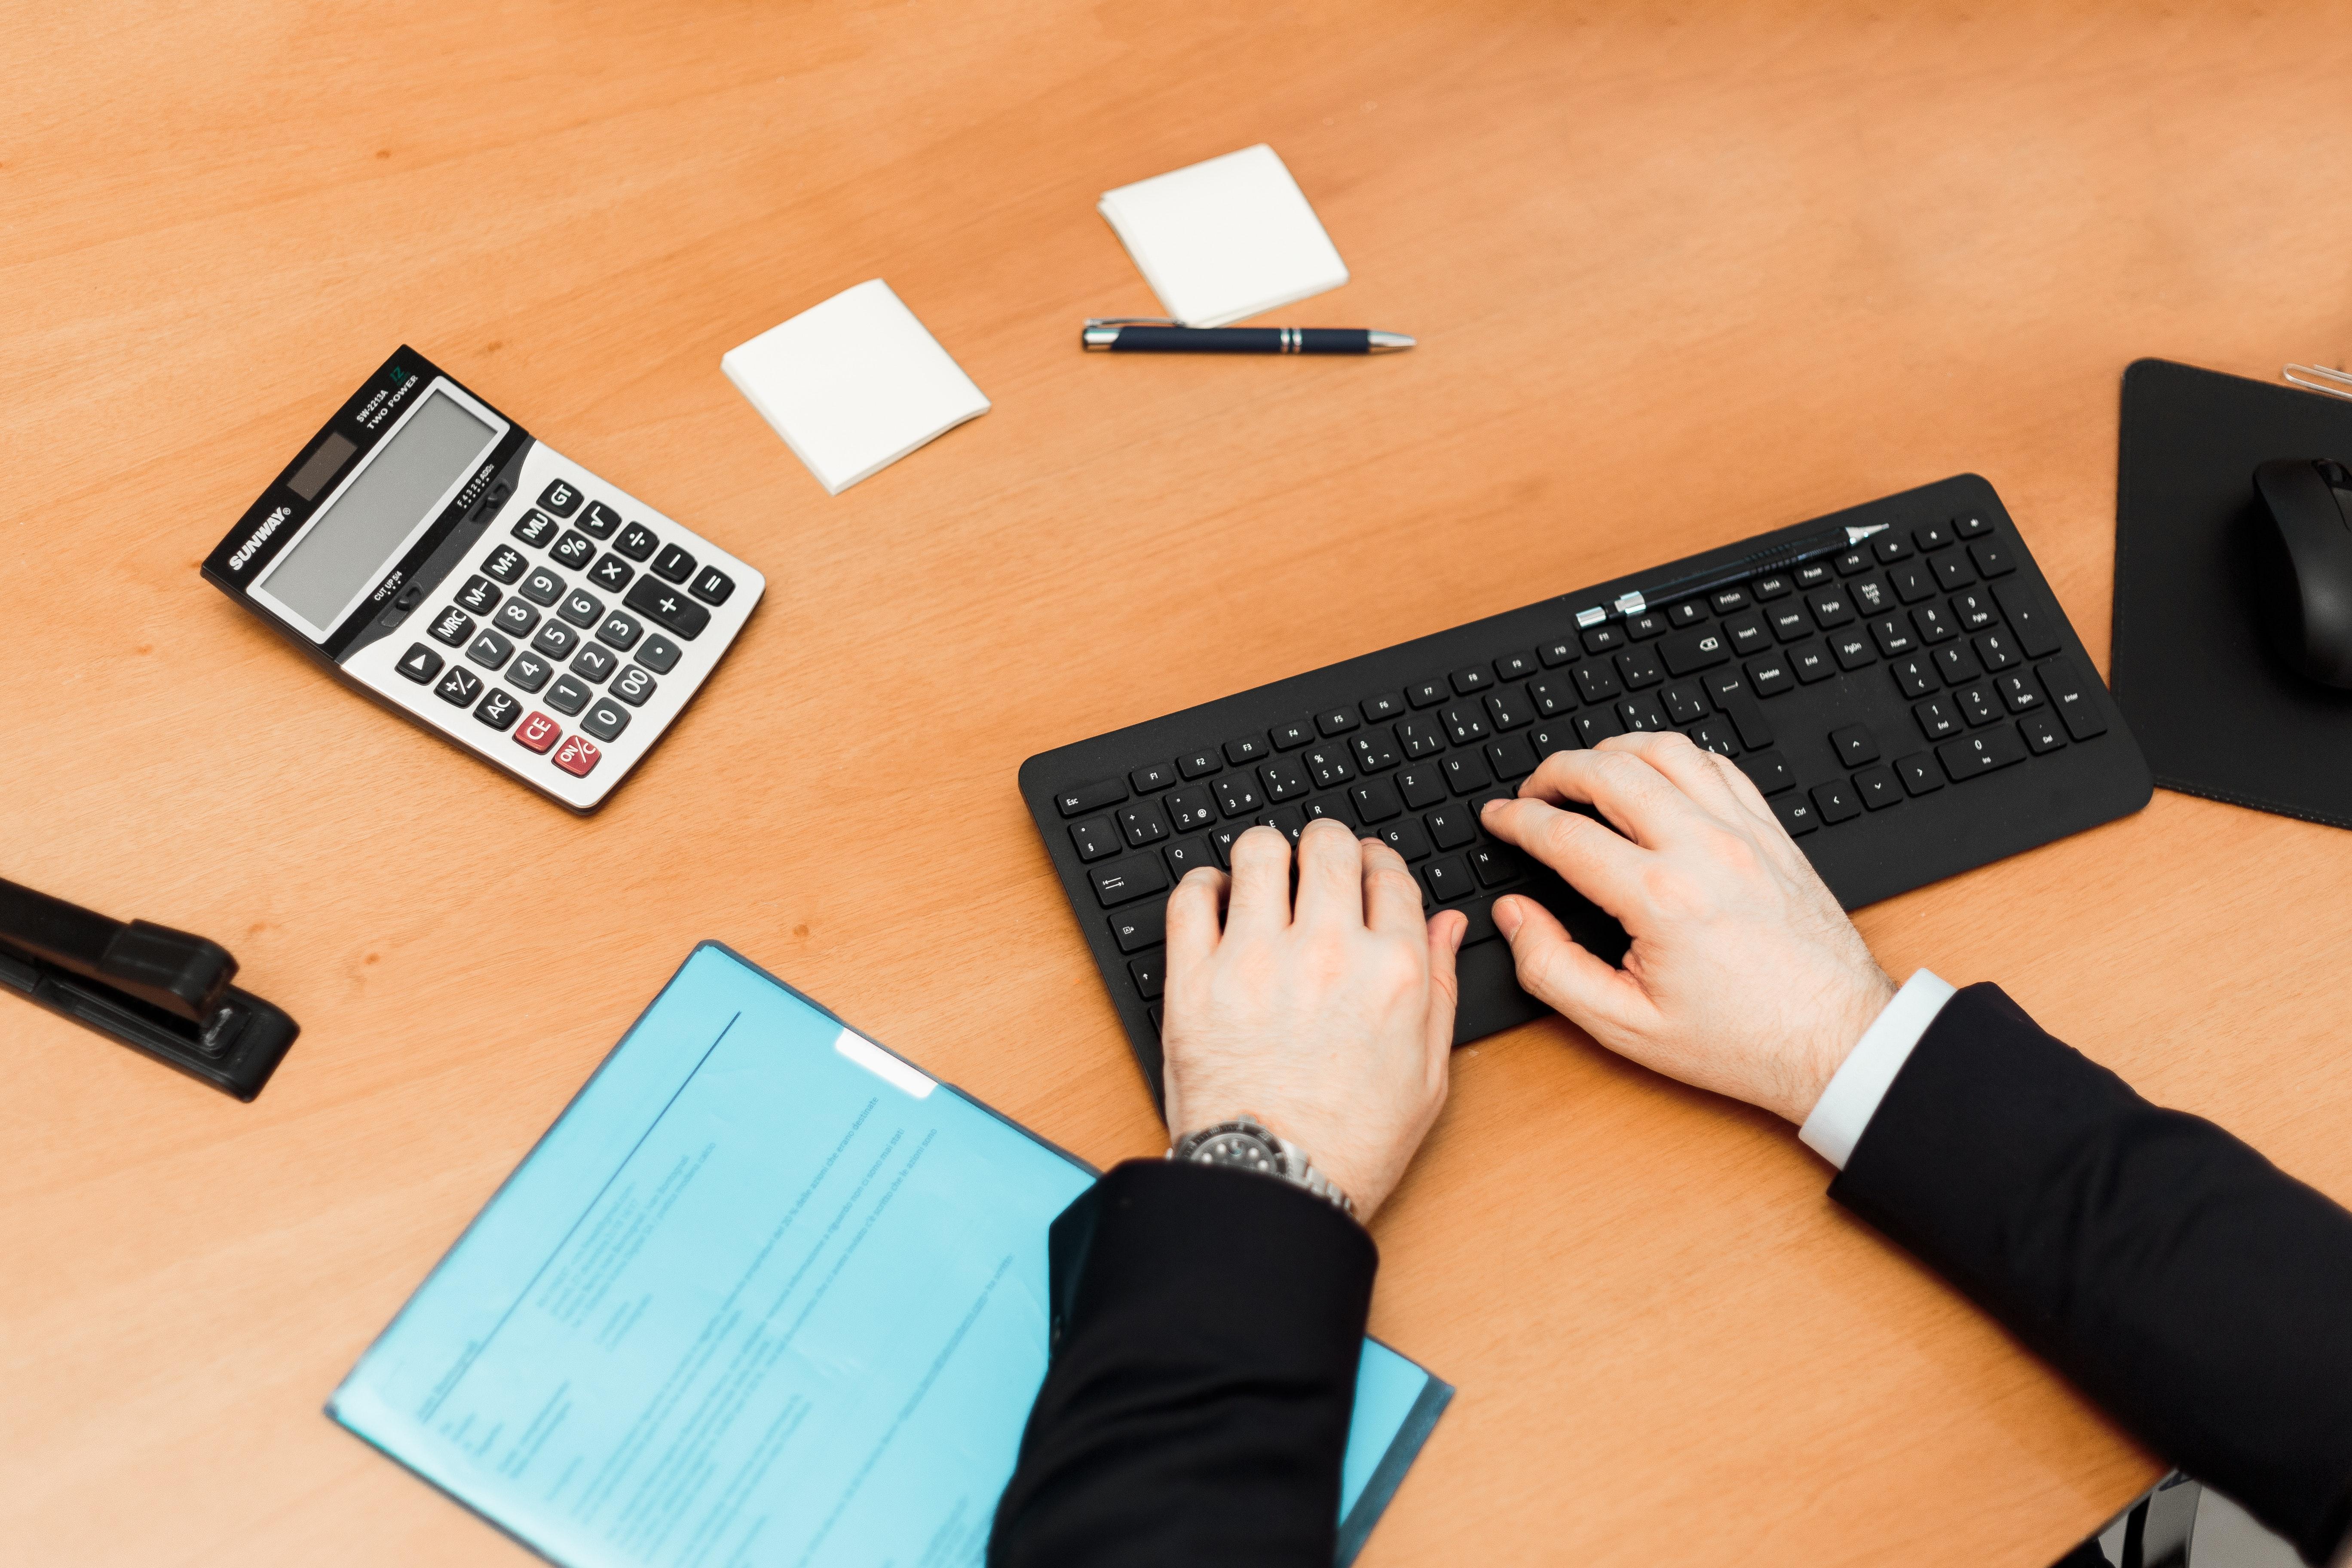 Still checking EMI Calculators for Personal Loans?